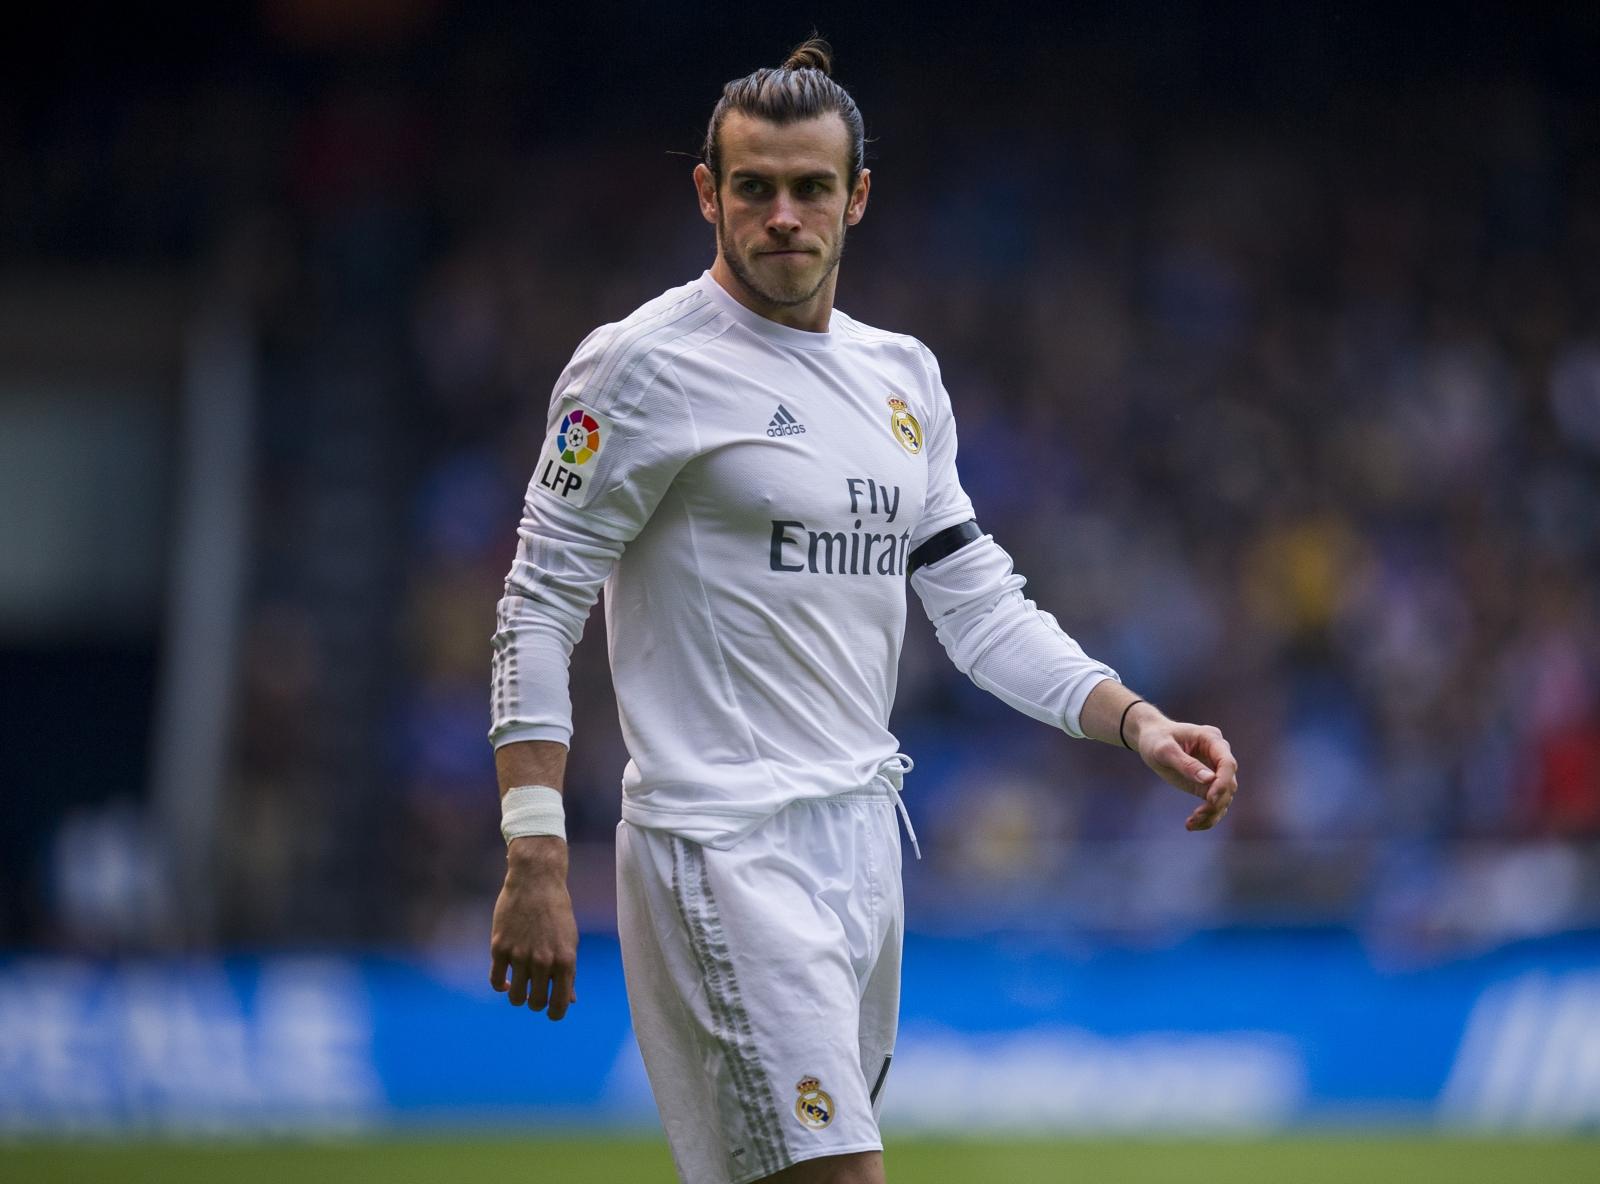 Madrid Liga La Gareth Bale reveals star the how  Real and